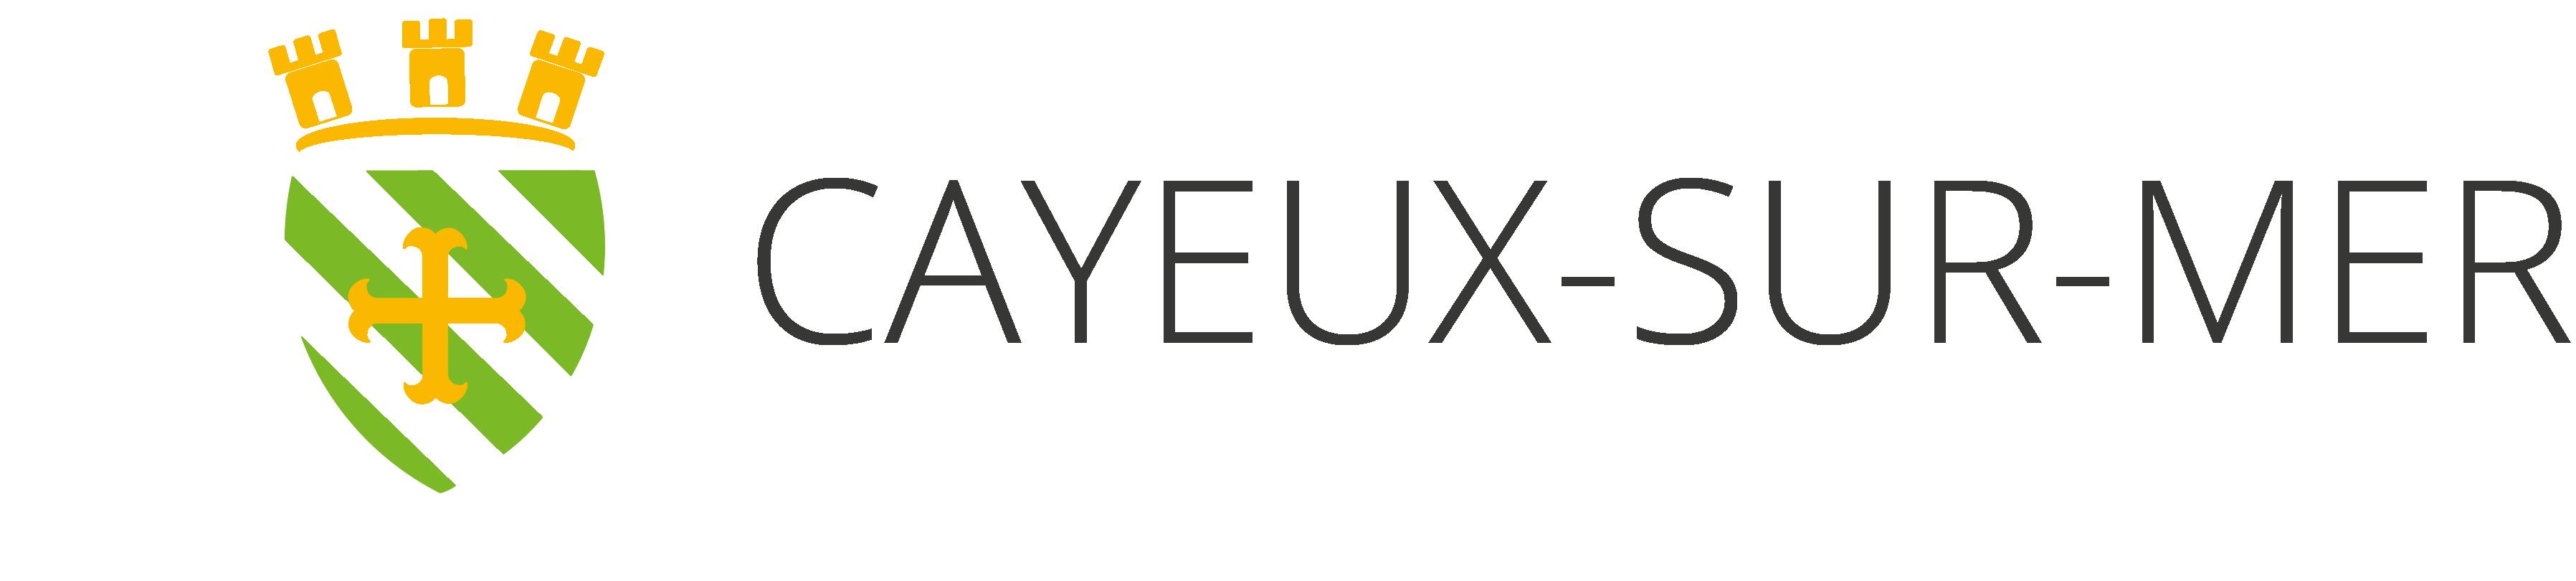 Cayeux-sur-Mer